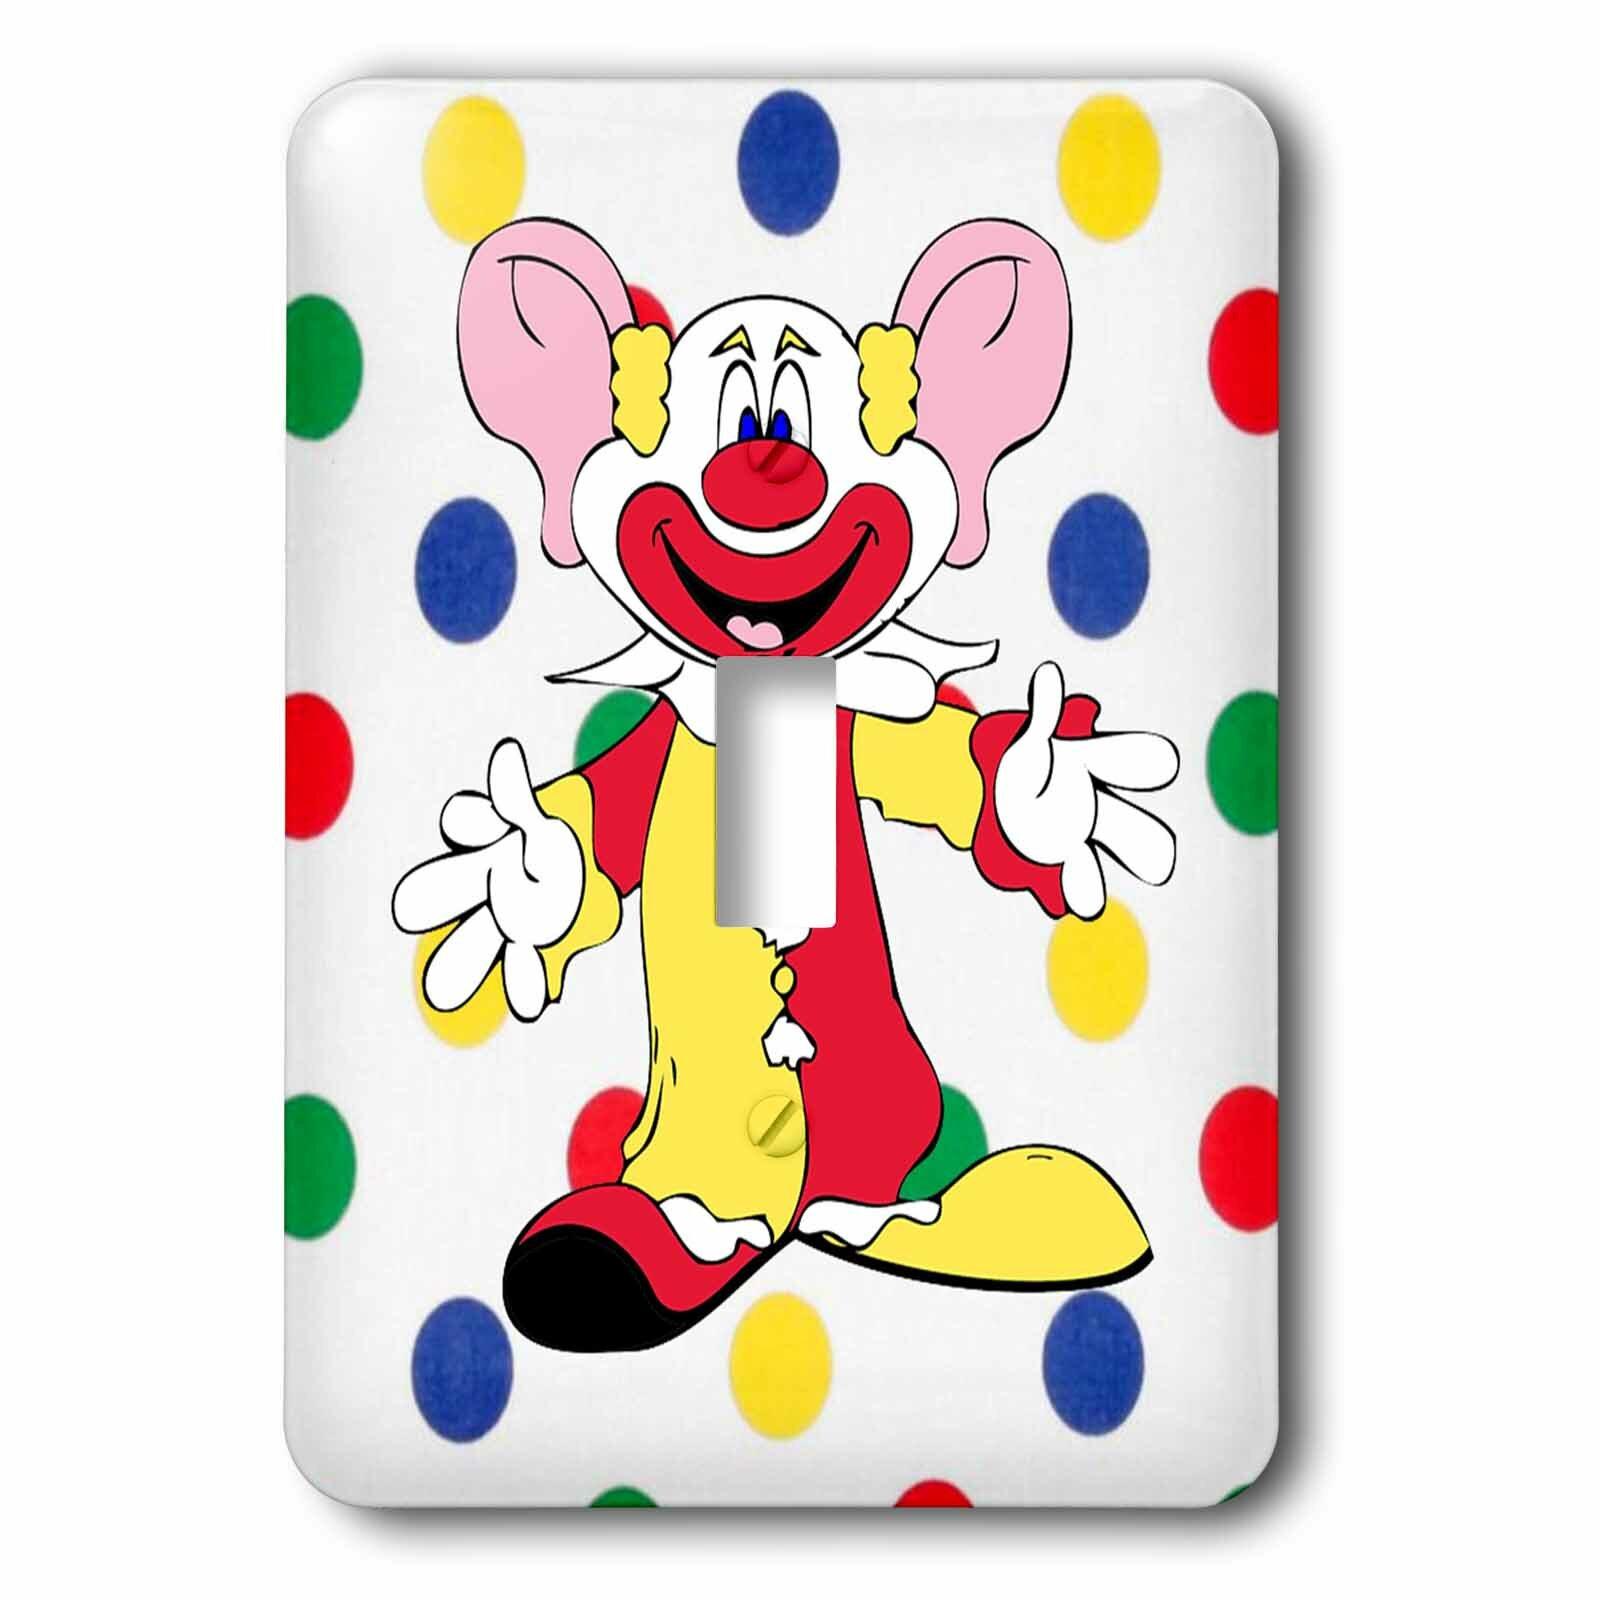 3drose Clown On Multi Dots 1 Gang Toggle Light Switch Wall Plate Wayfair